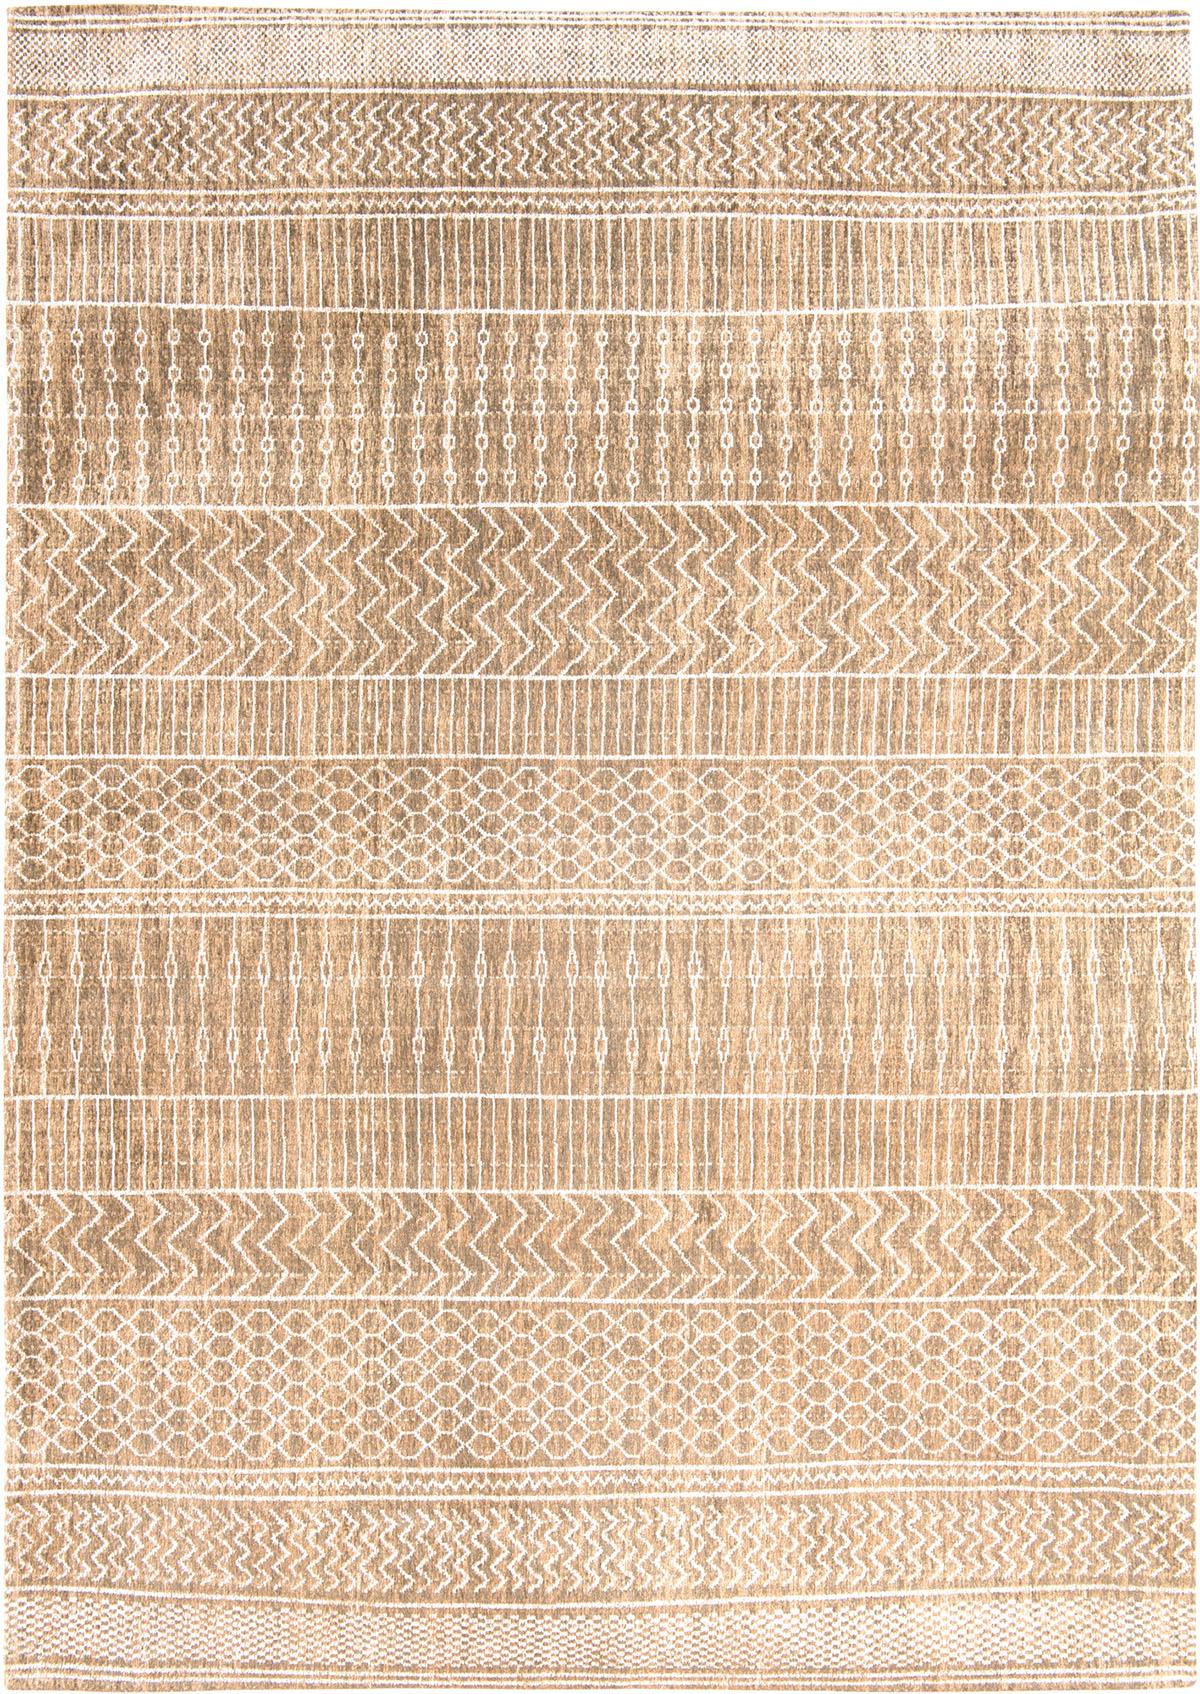 beżowy dywan we wzory - sandy gold 8674